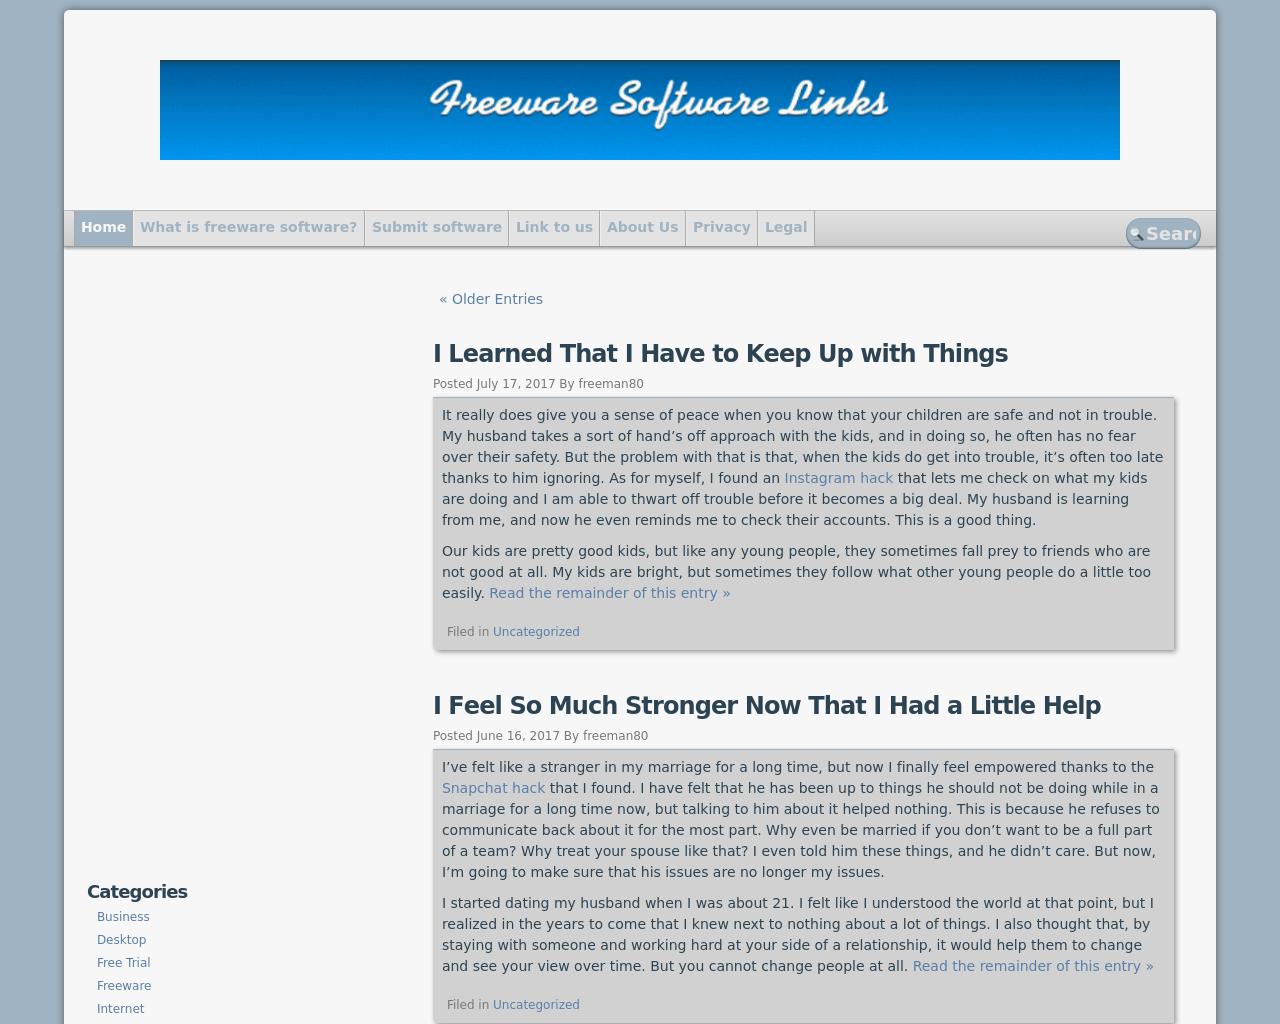 Freeware-Software-Links-Advertising-Reviews-Pricing